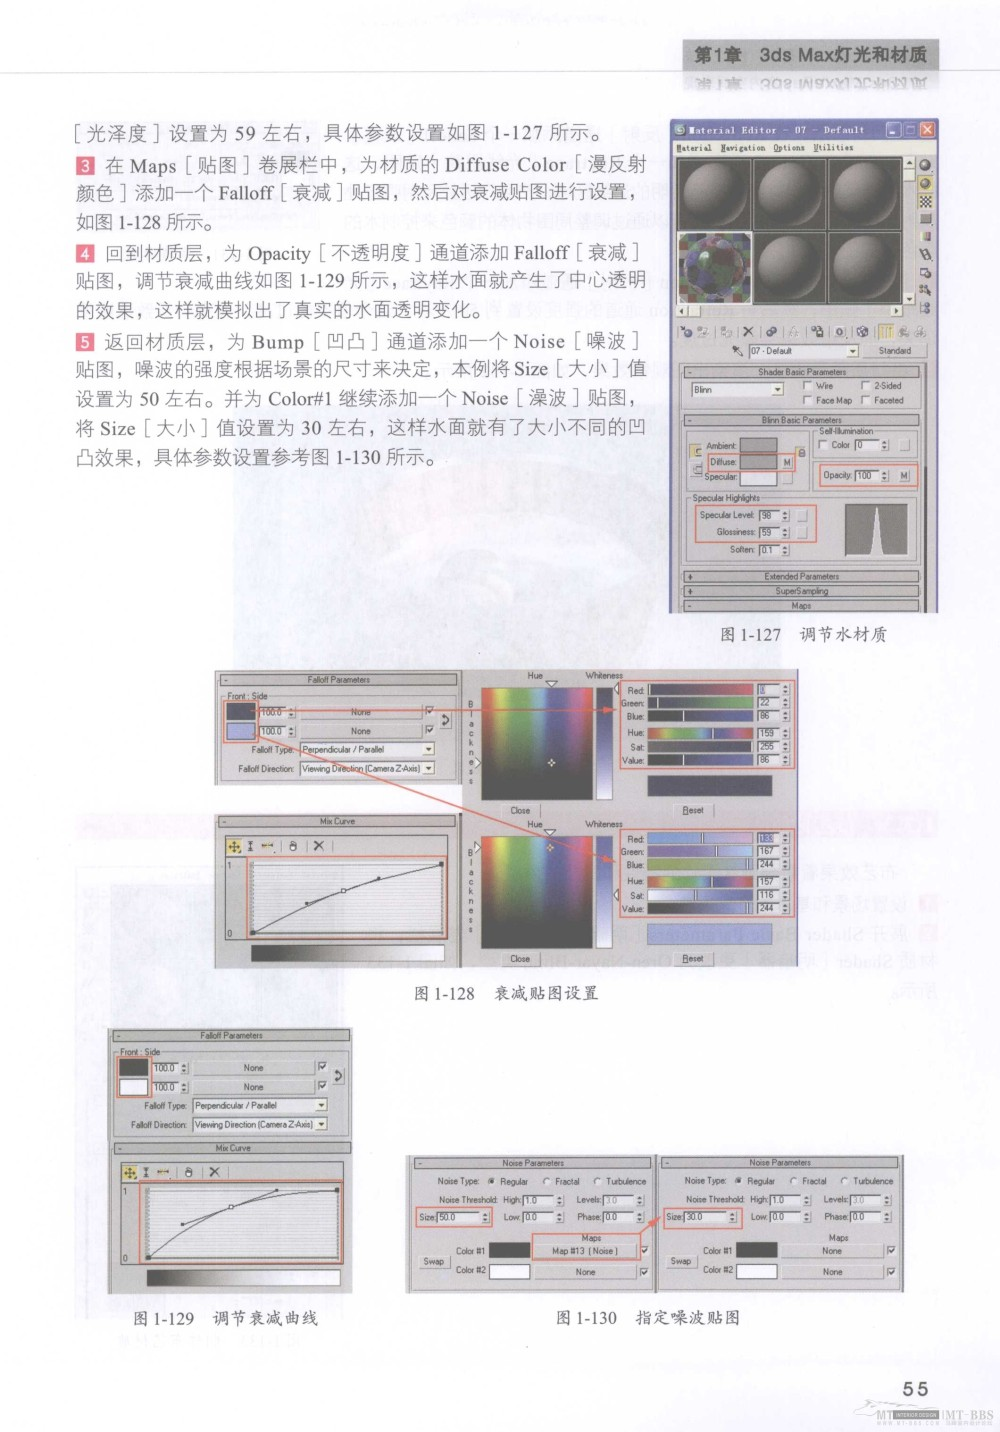 水晶石技法-3ds_Max&VRay室内空间表现_水晶石技法-3ds_Max&VRay室内空间表现_页面_061.jpg